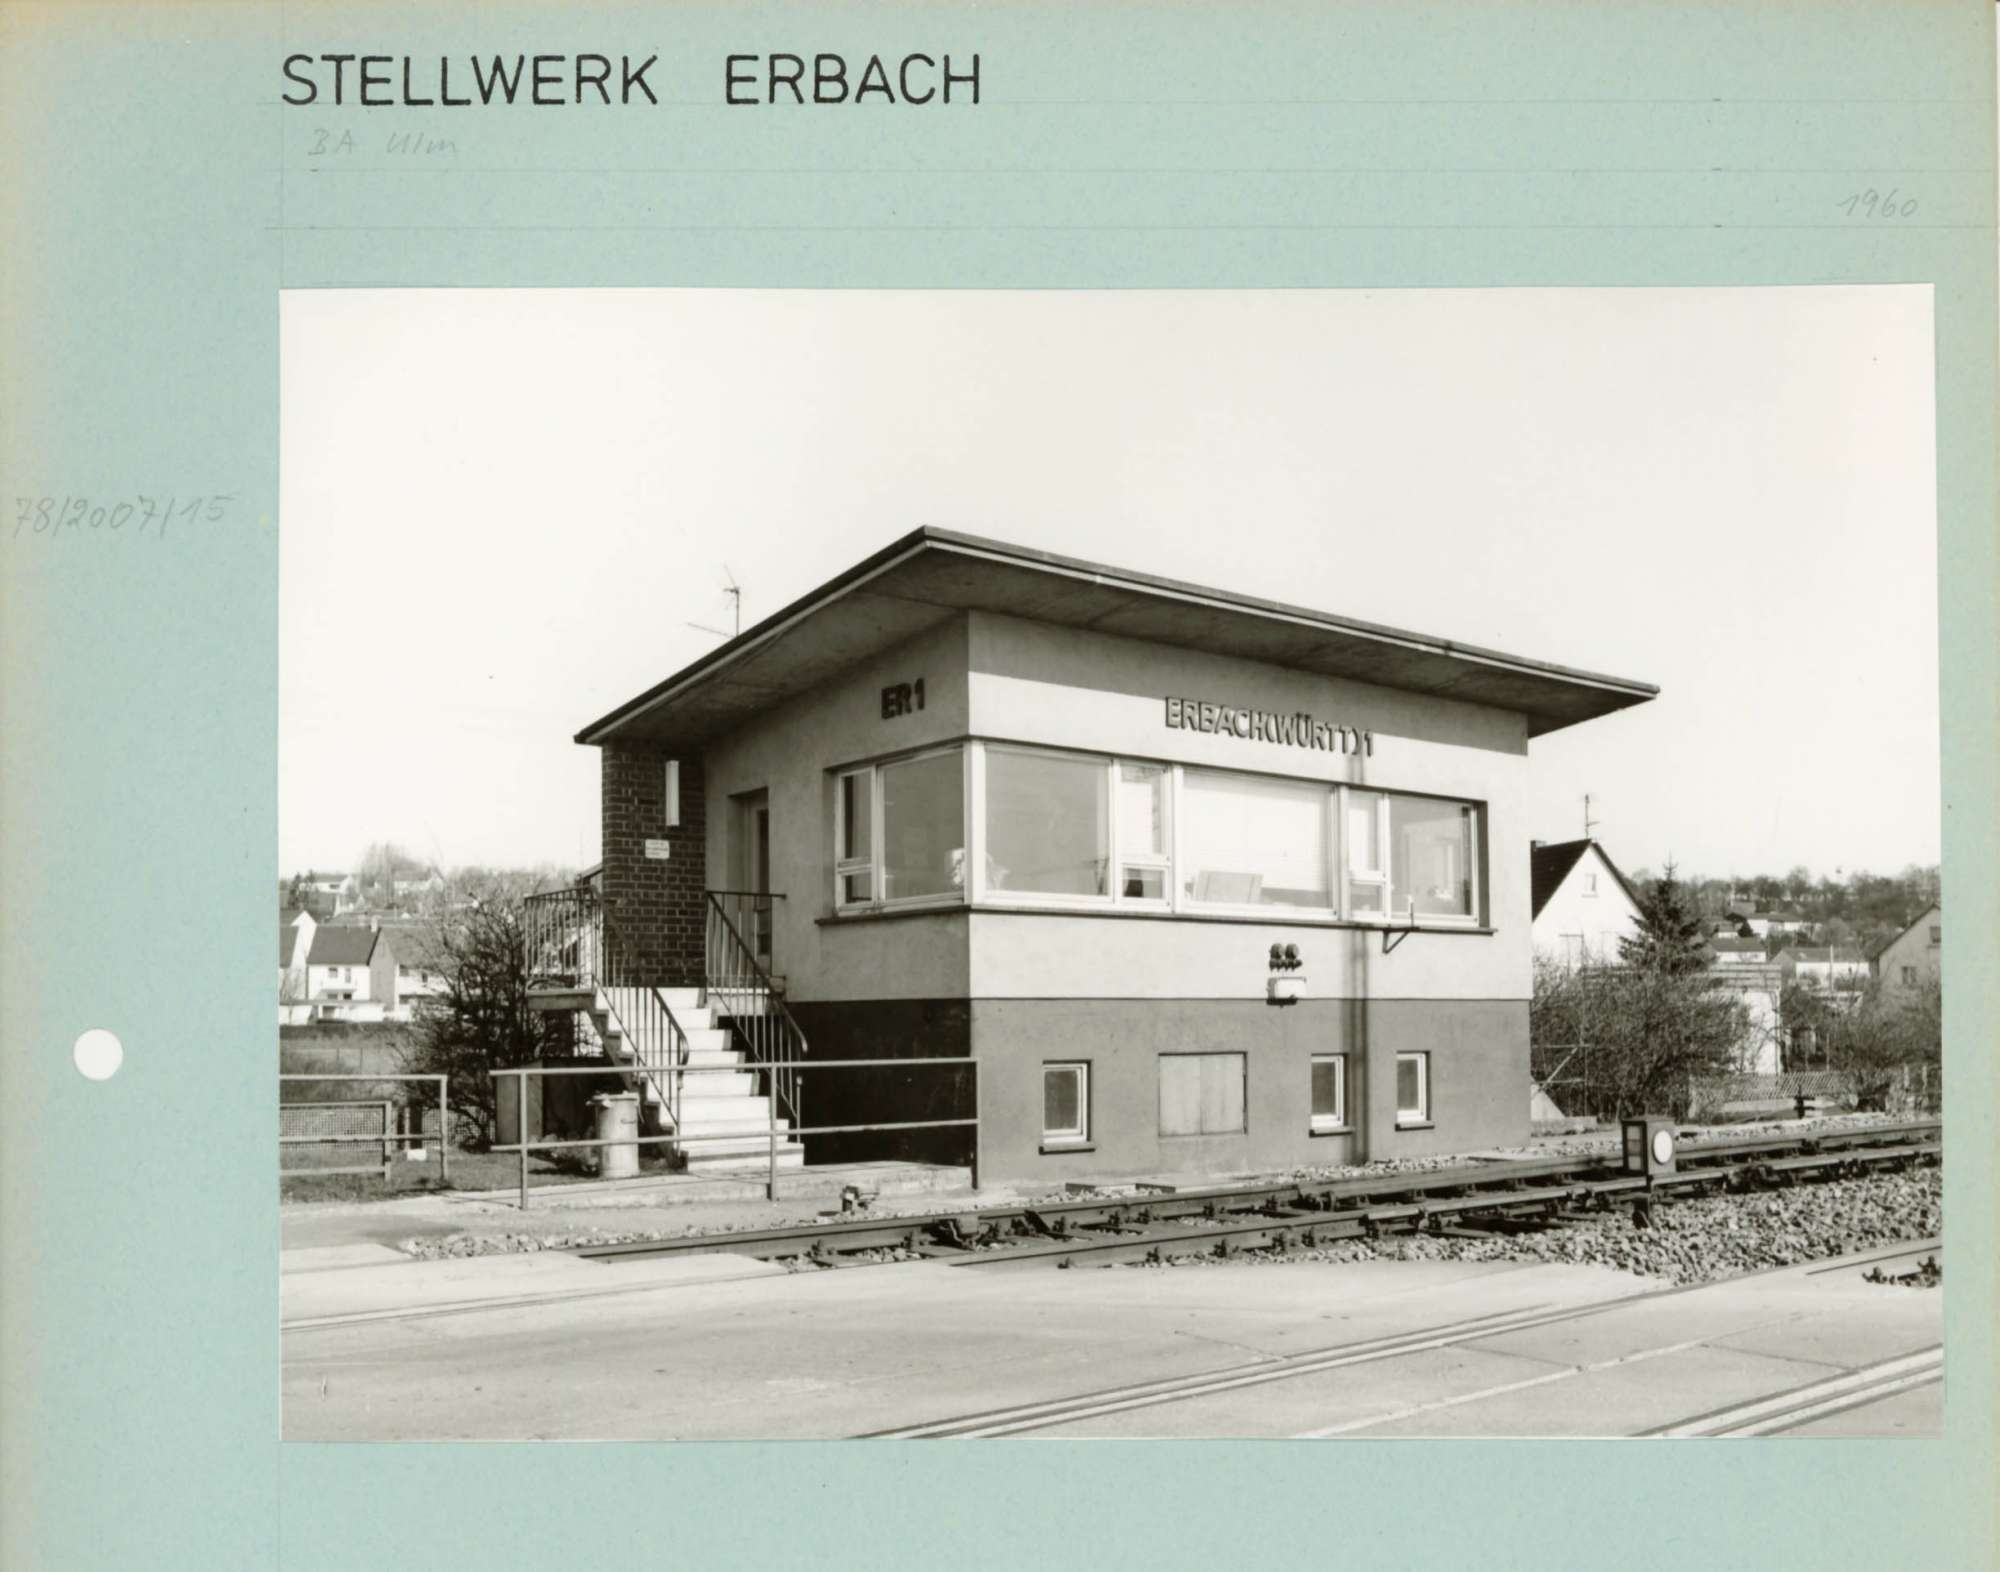 Erbach: 6 Fotos u.a., Bild 1